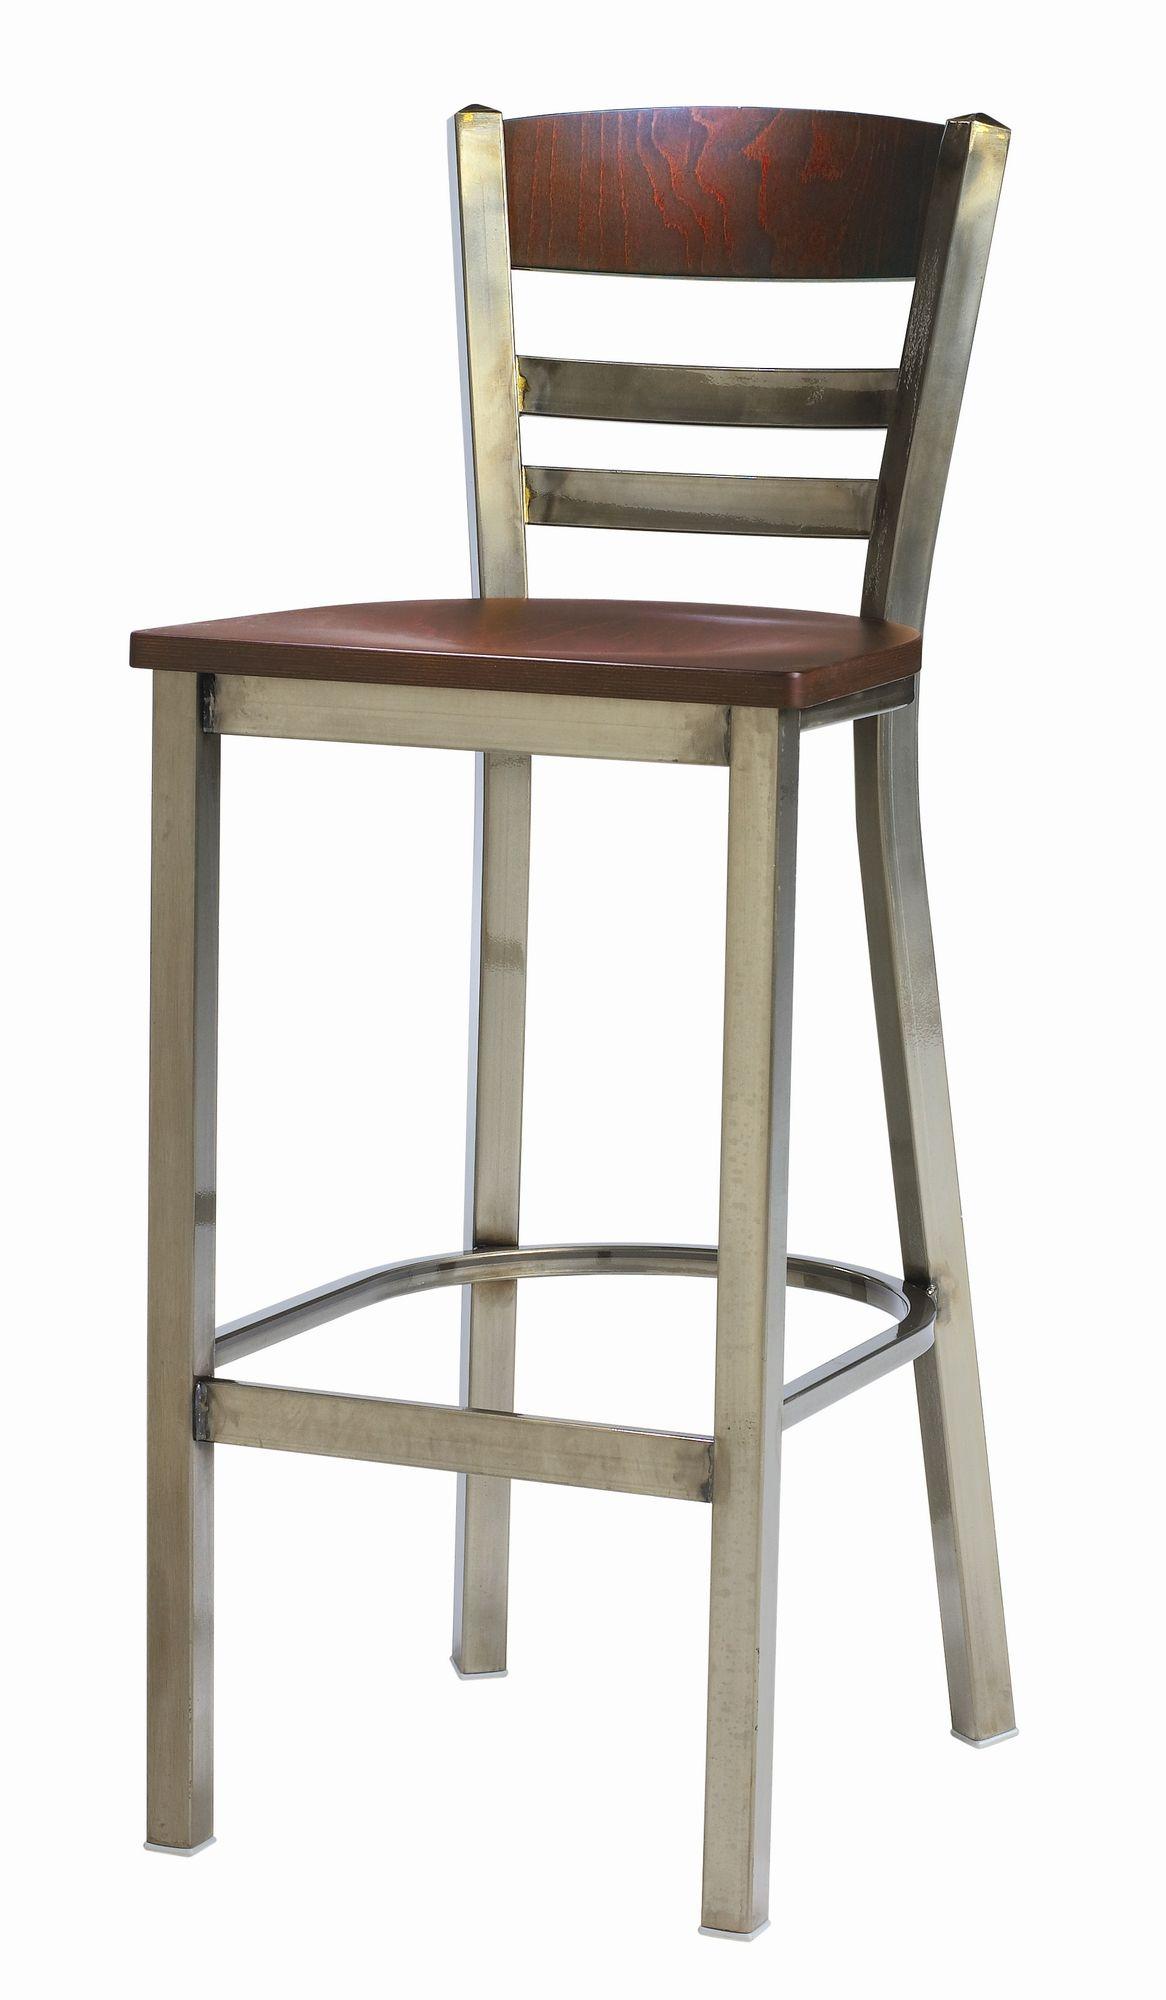 Grand Rapids Chair Bar Stools   Bar stools, Kitchen bar stools ...